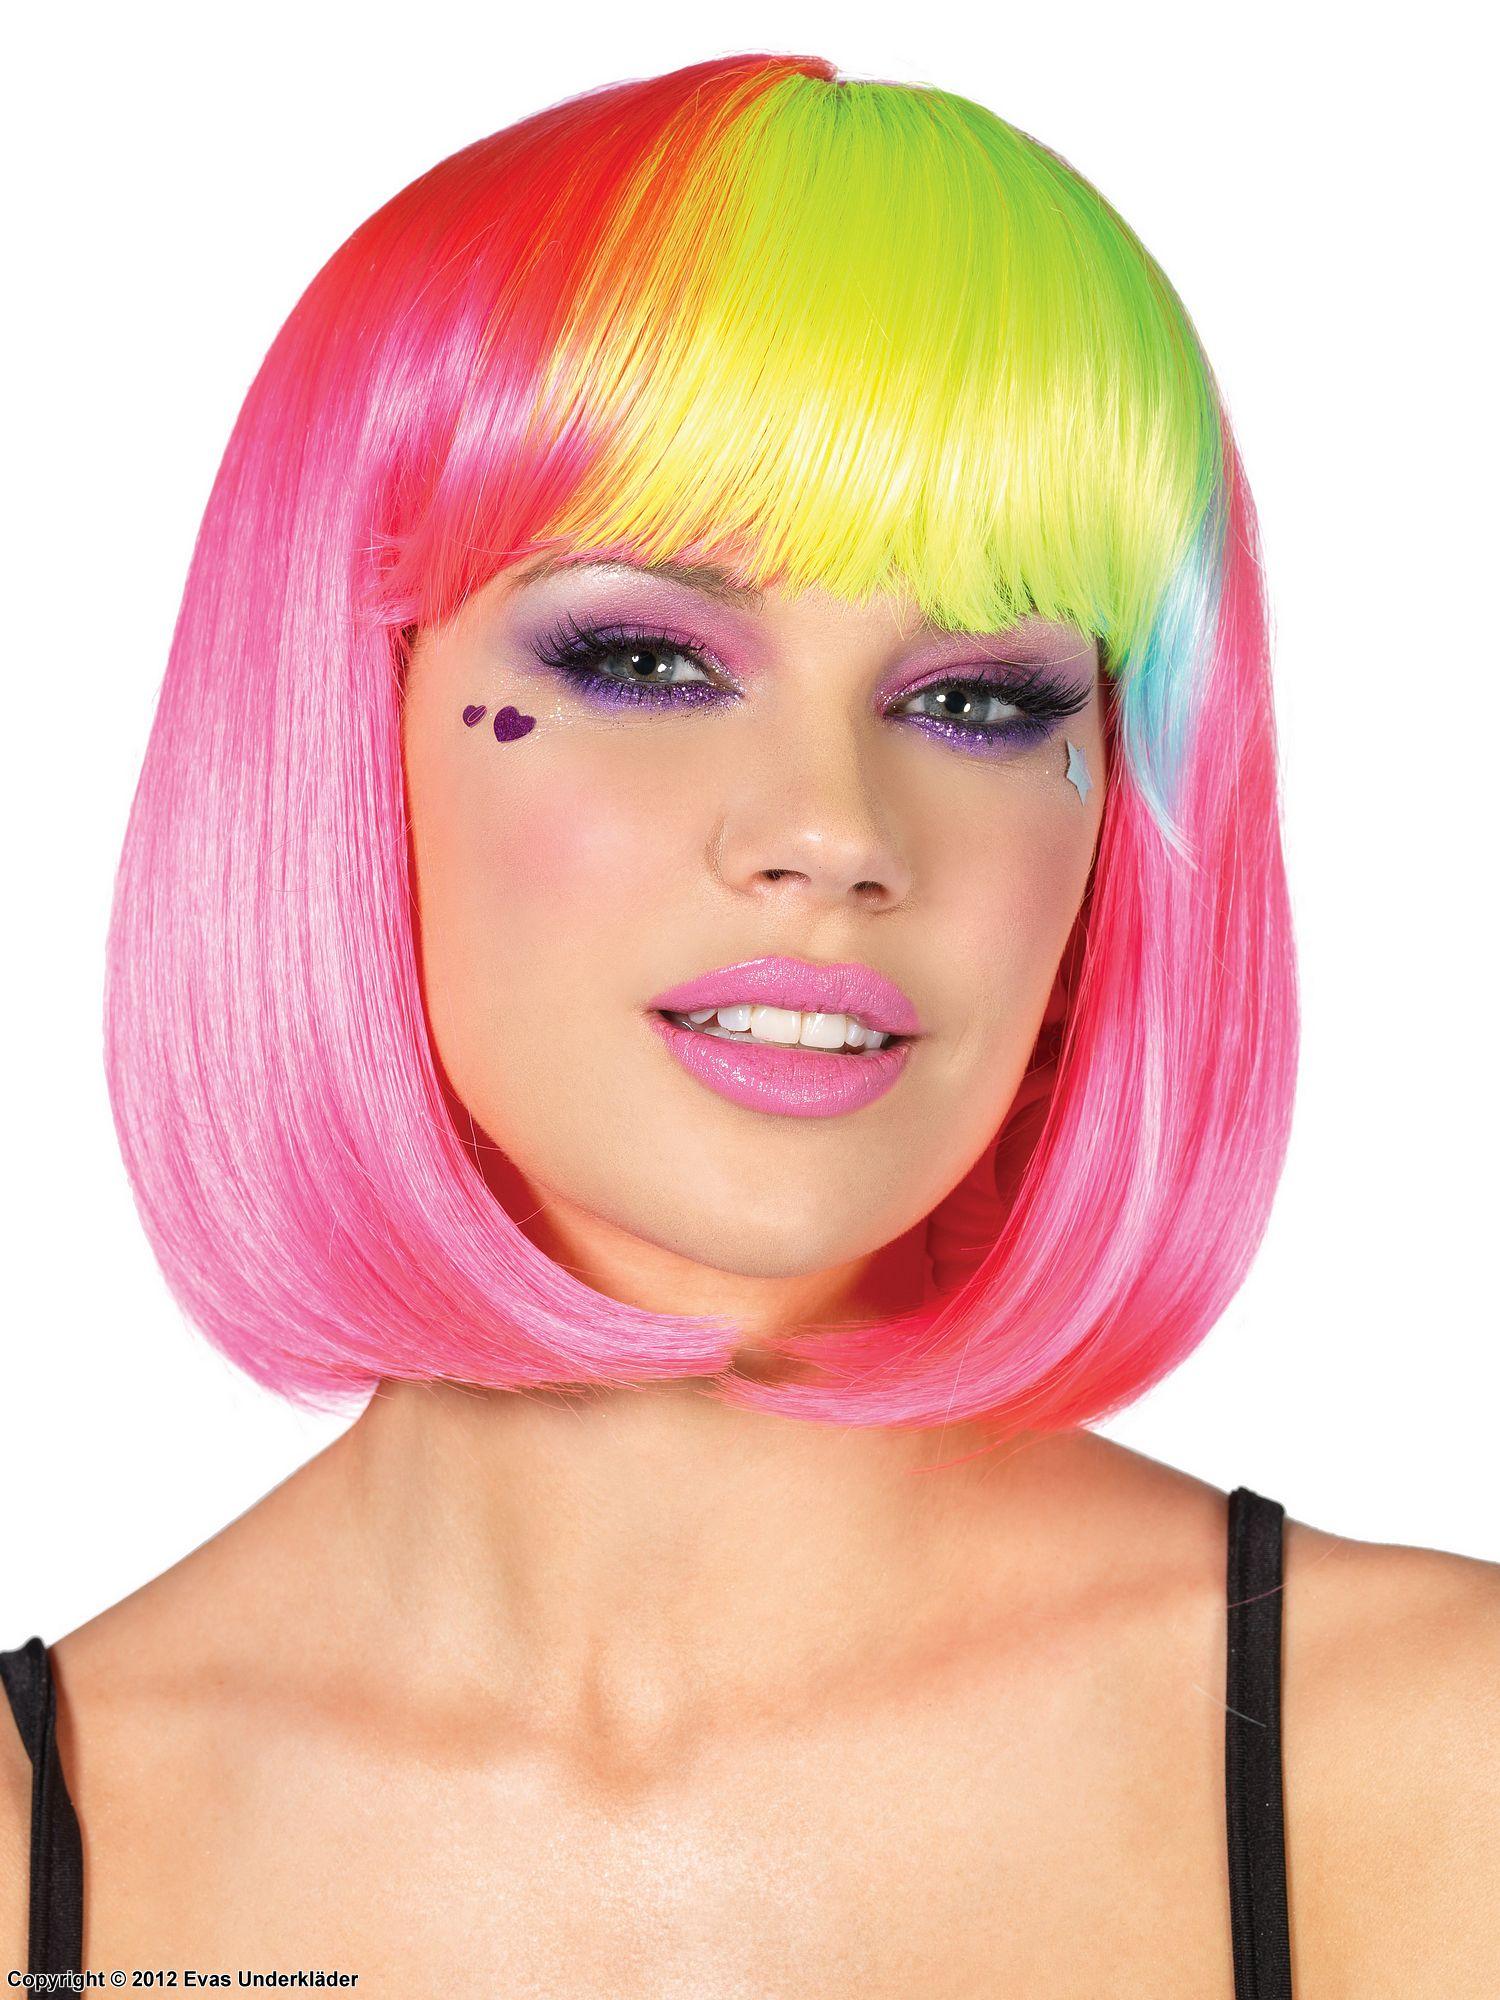 Kort peruk med flerfärgad lugg